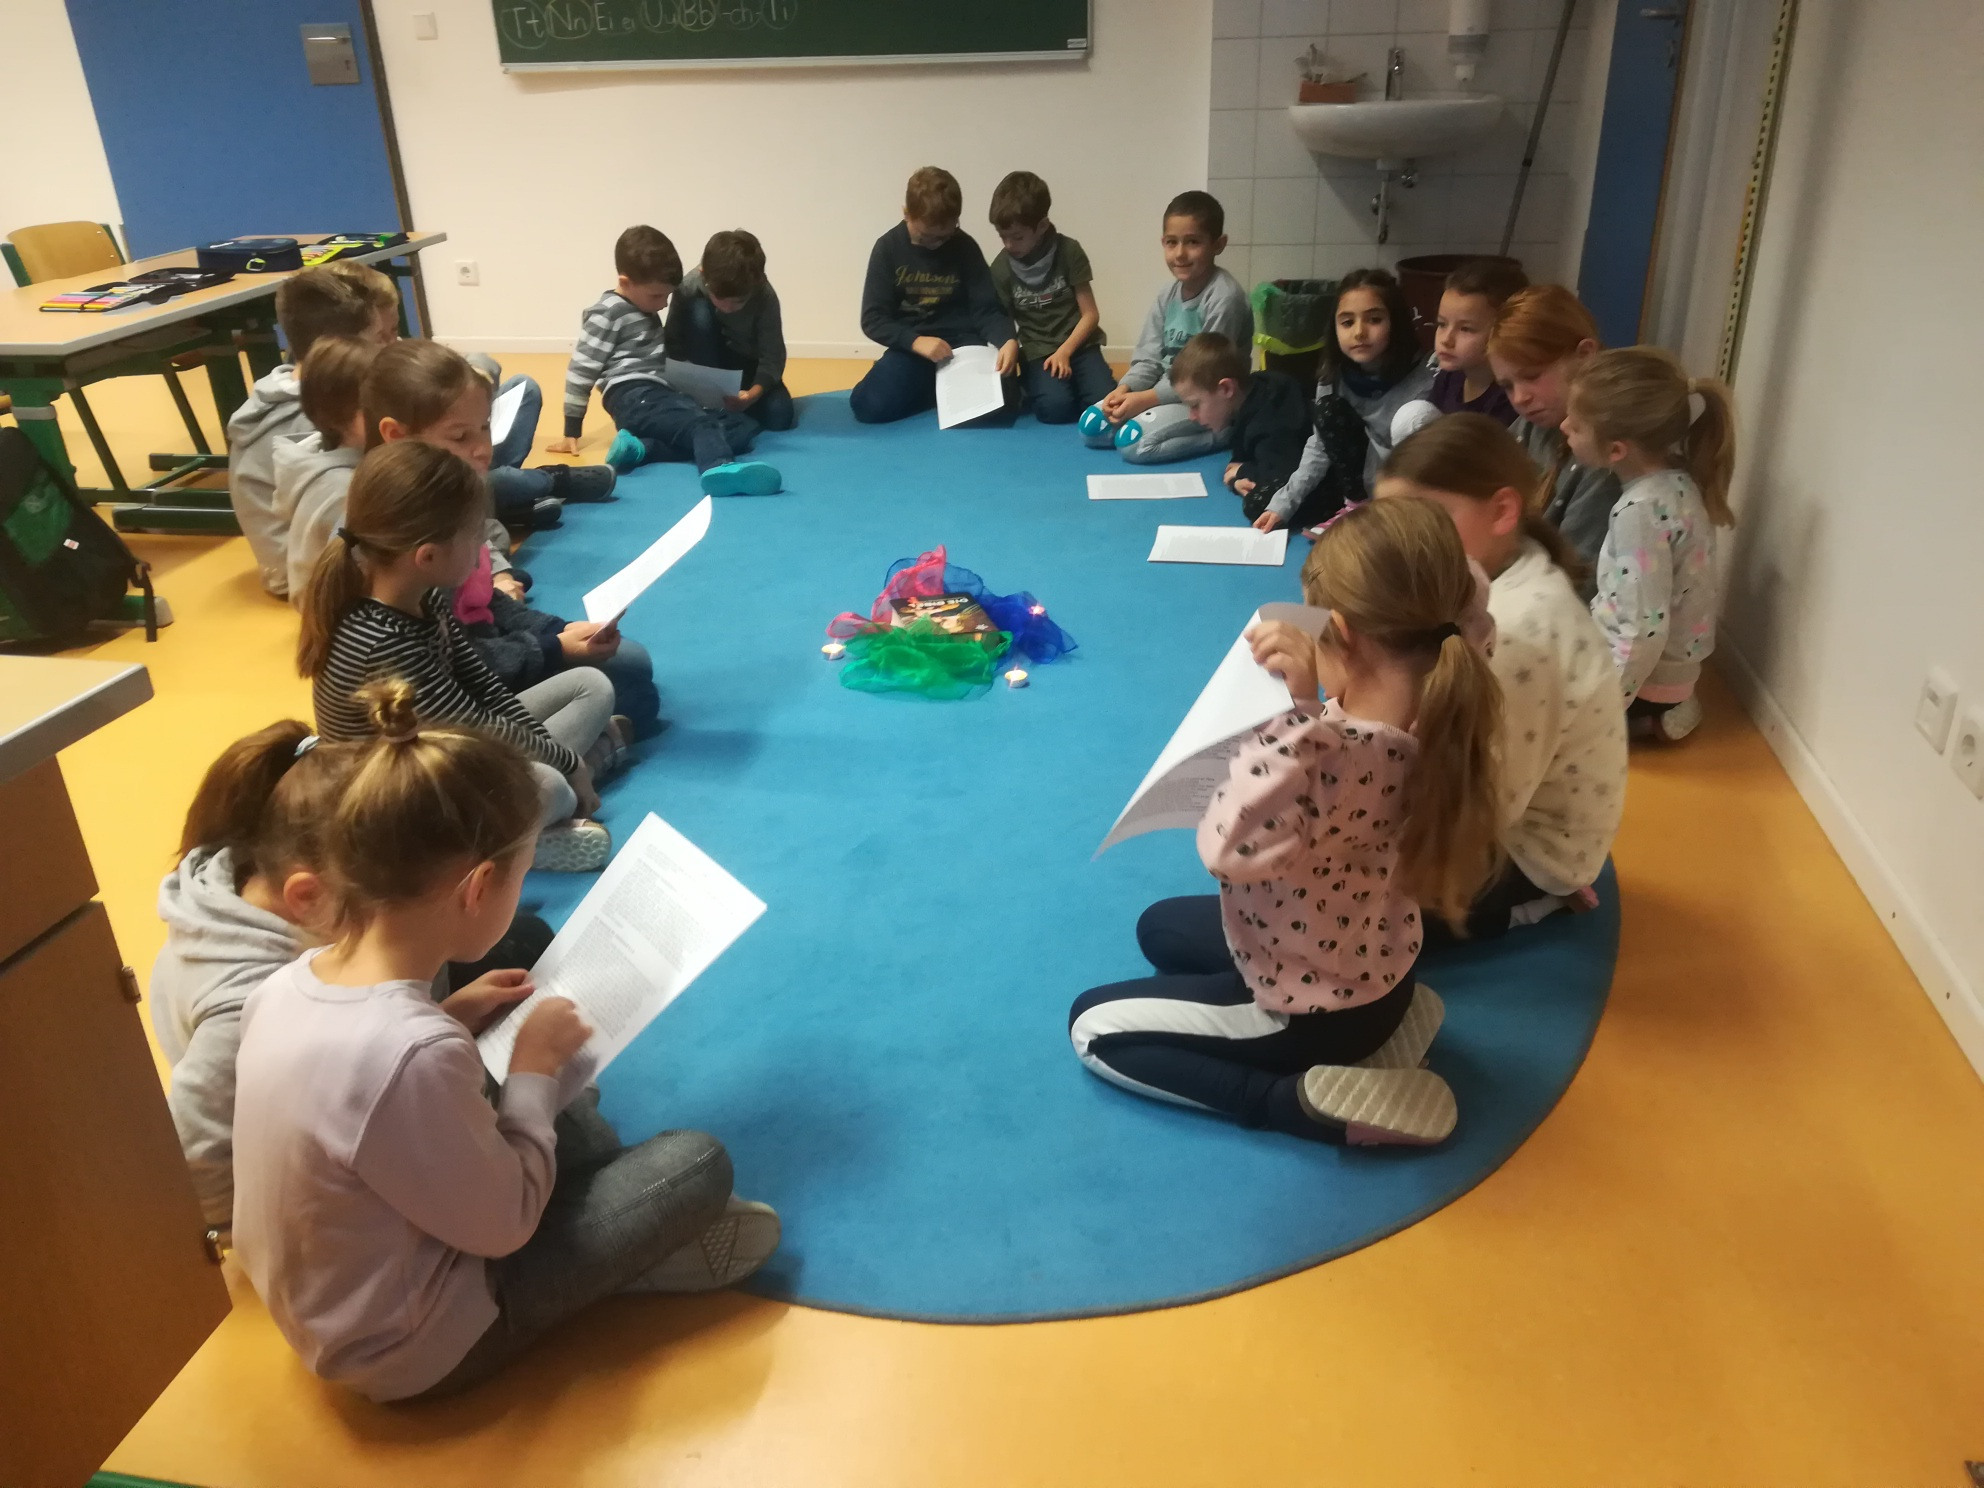 Grundschule Tiefenbach 20 01 Burkhart 1